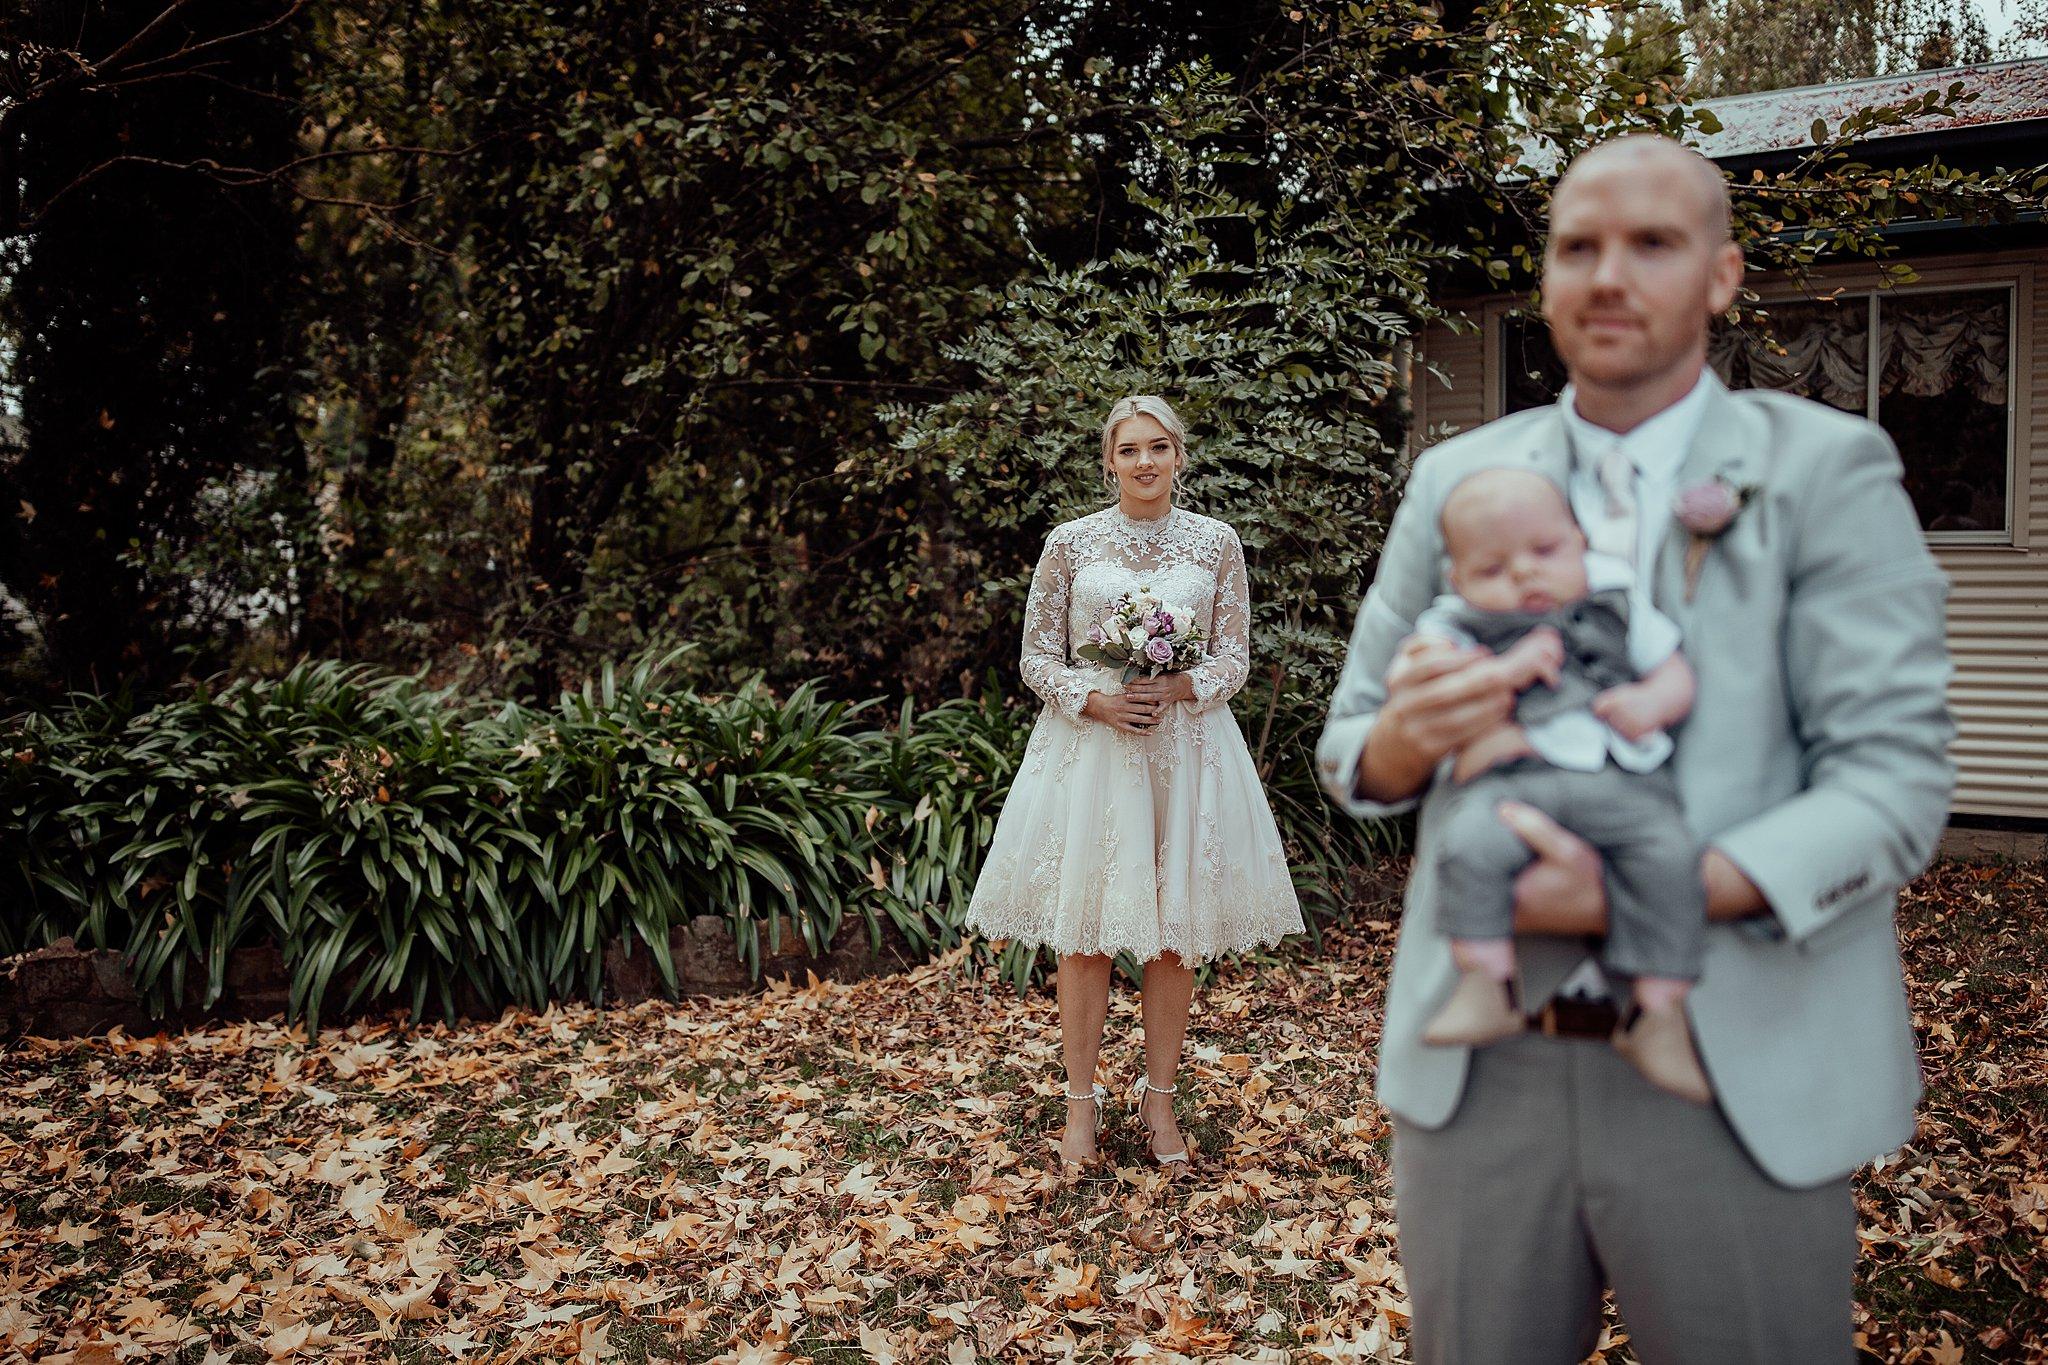 mickalathomas_puremacphotography_weddingphotographer_couplephotographer_Sheppartonphotographer_3408.jpg